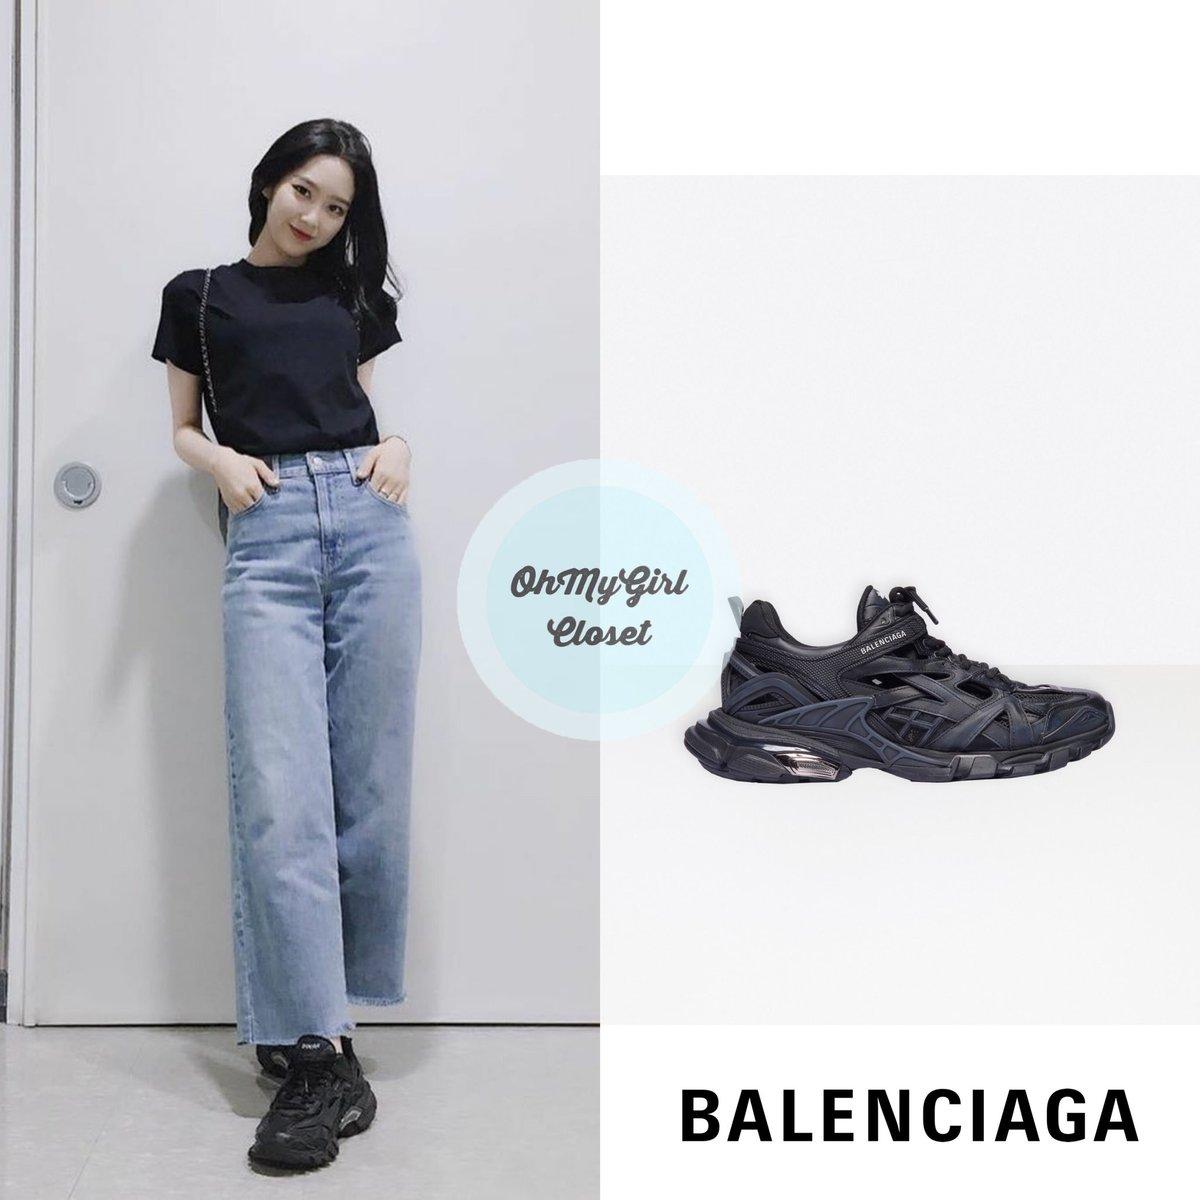 200601 #Jiho - instagram update wearing  Balenciaga - track 2 sneakers $975 #ohmygirl_balenciaga #omgc_jiho  #OHMYGIRL #NONSTOP #지호 #오마이걸 #살짝설렜어 #ohmygirlfashion #ohmygirlstyle #ohmygirlcloset #퀸덤 #Queendom pic.twitter.com/0DtCxXny7e